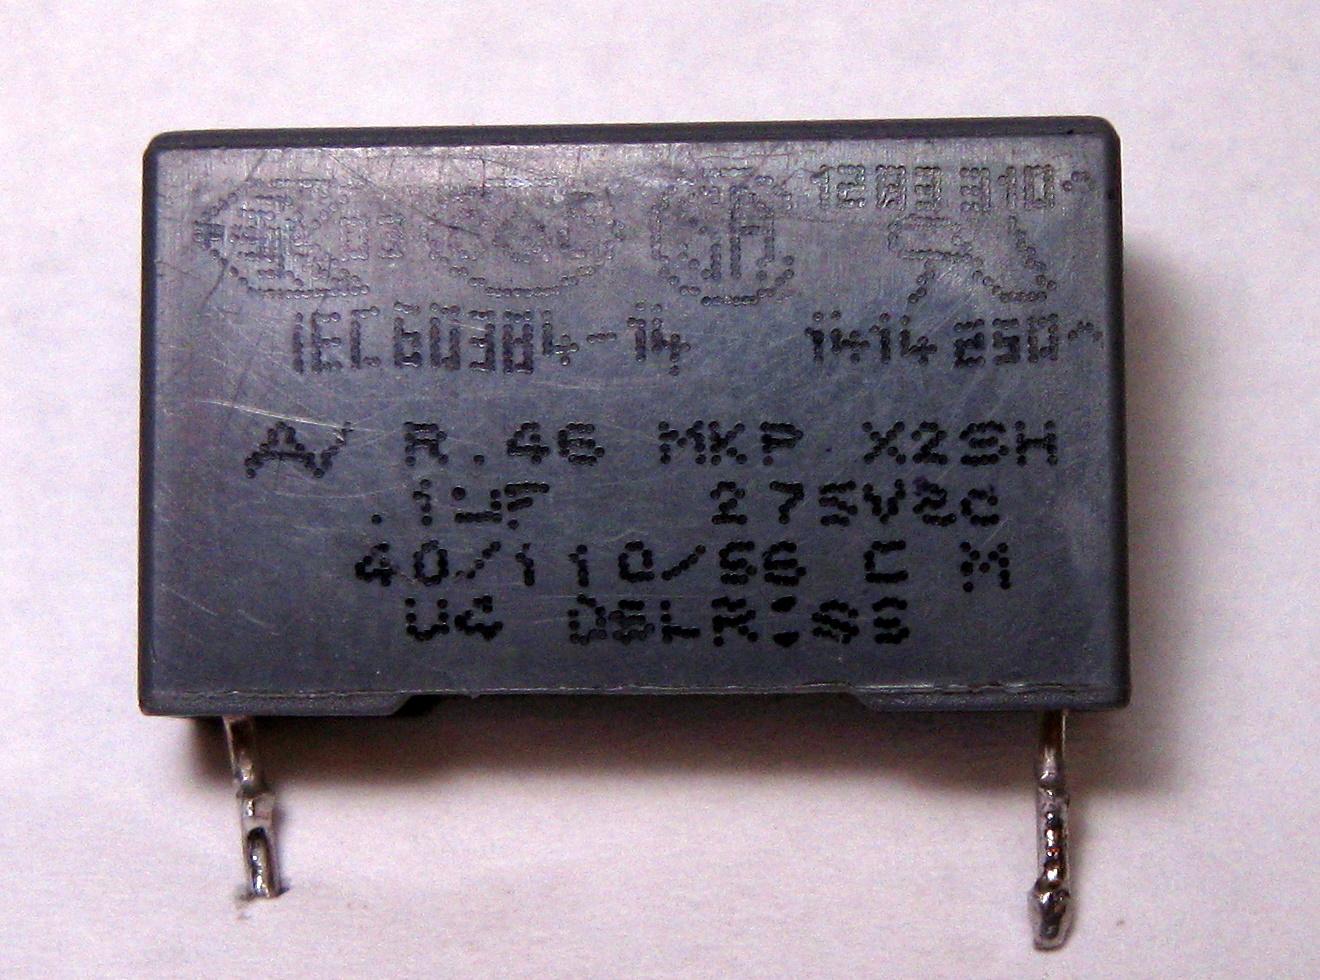 http://elation.kiev.ua/components/com_agora/img/members/3213/IMG-9311.jpg